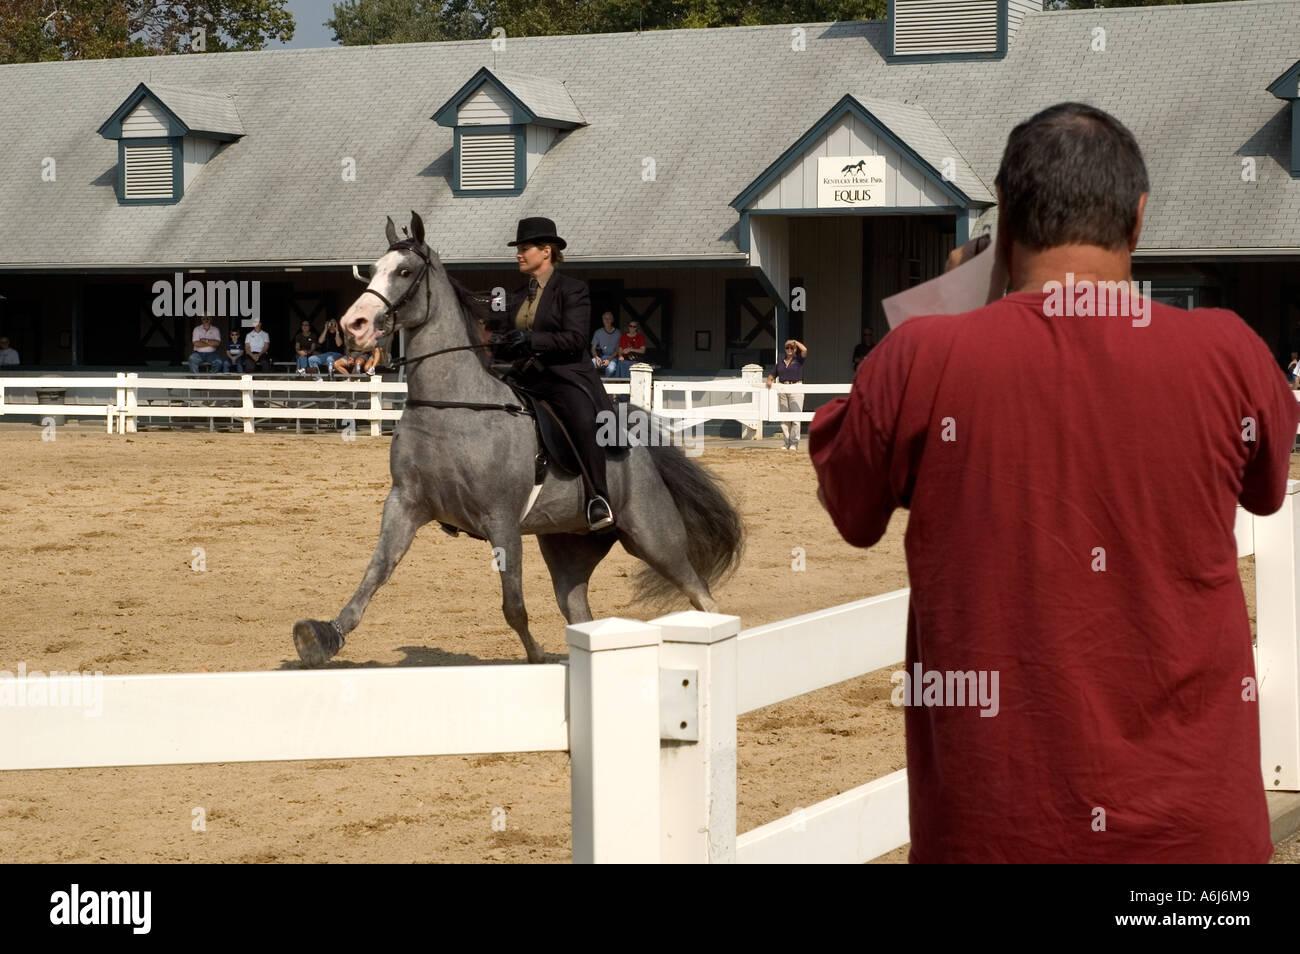 Show Event at Kentucky Horse Park, Lexington, Kentucky Stock Photo